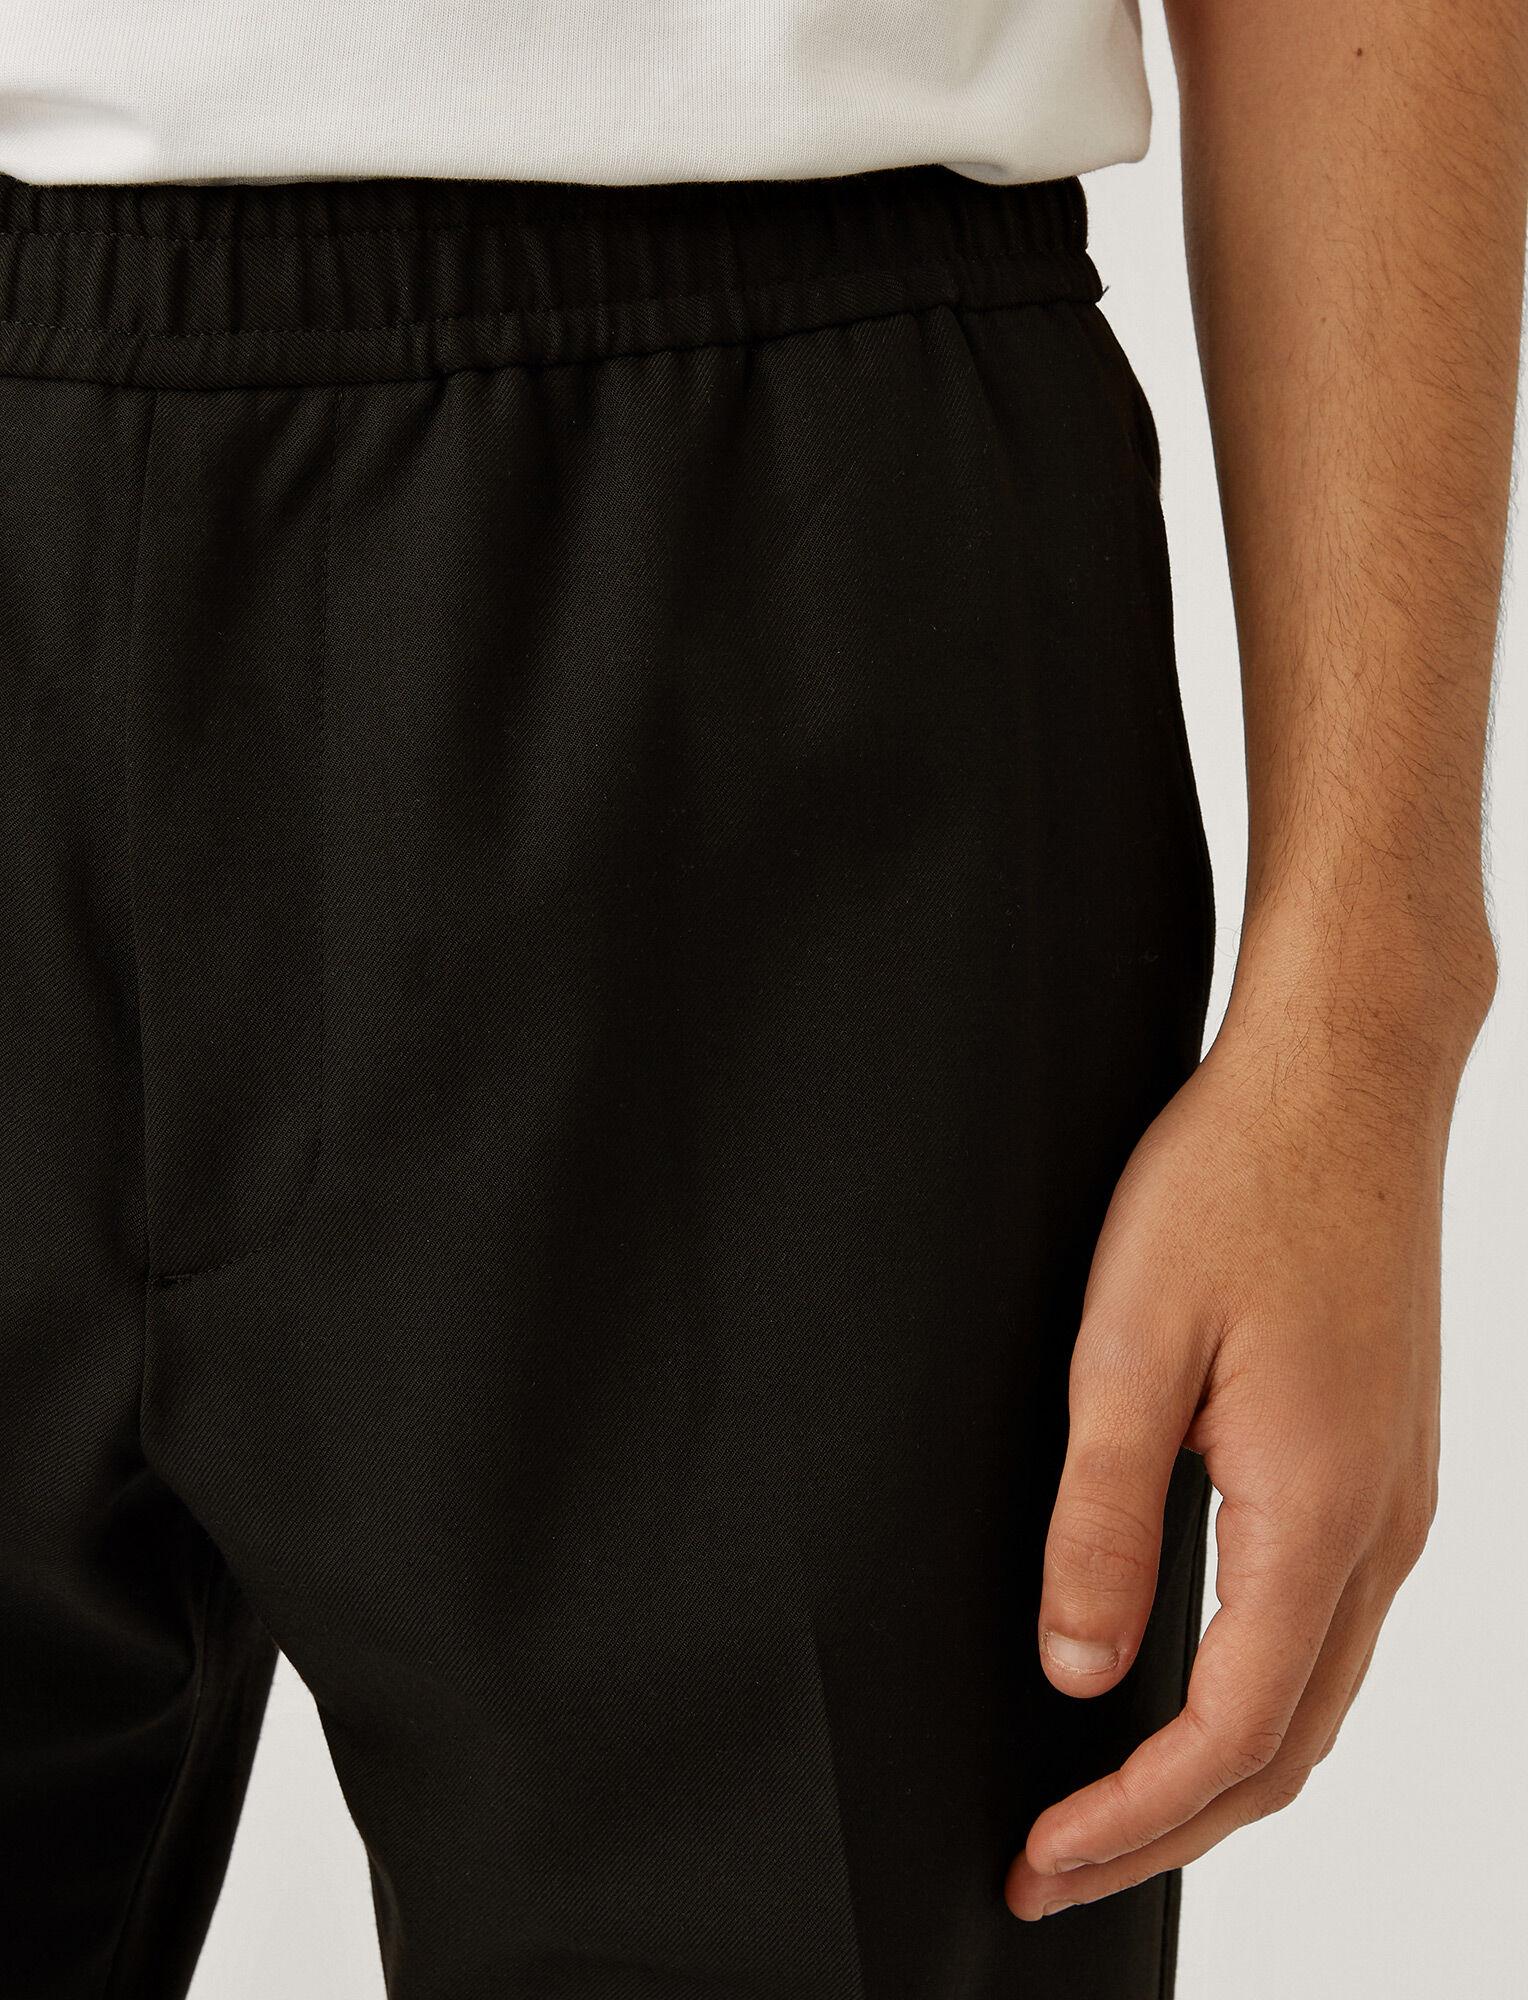 Joseph, Techno Wool Stretch Trousers, in Black